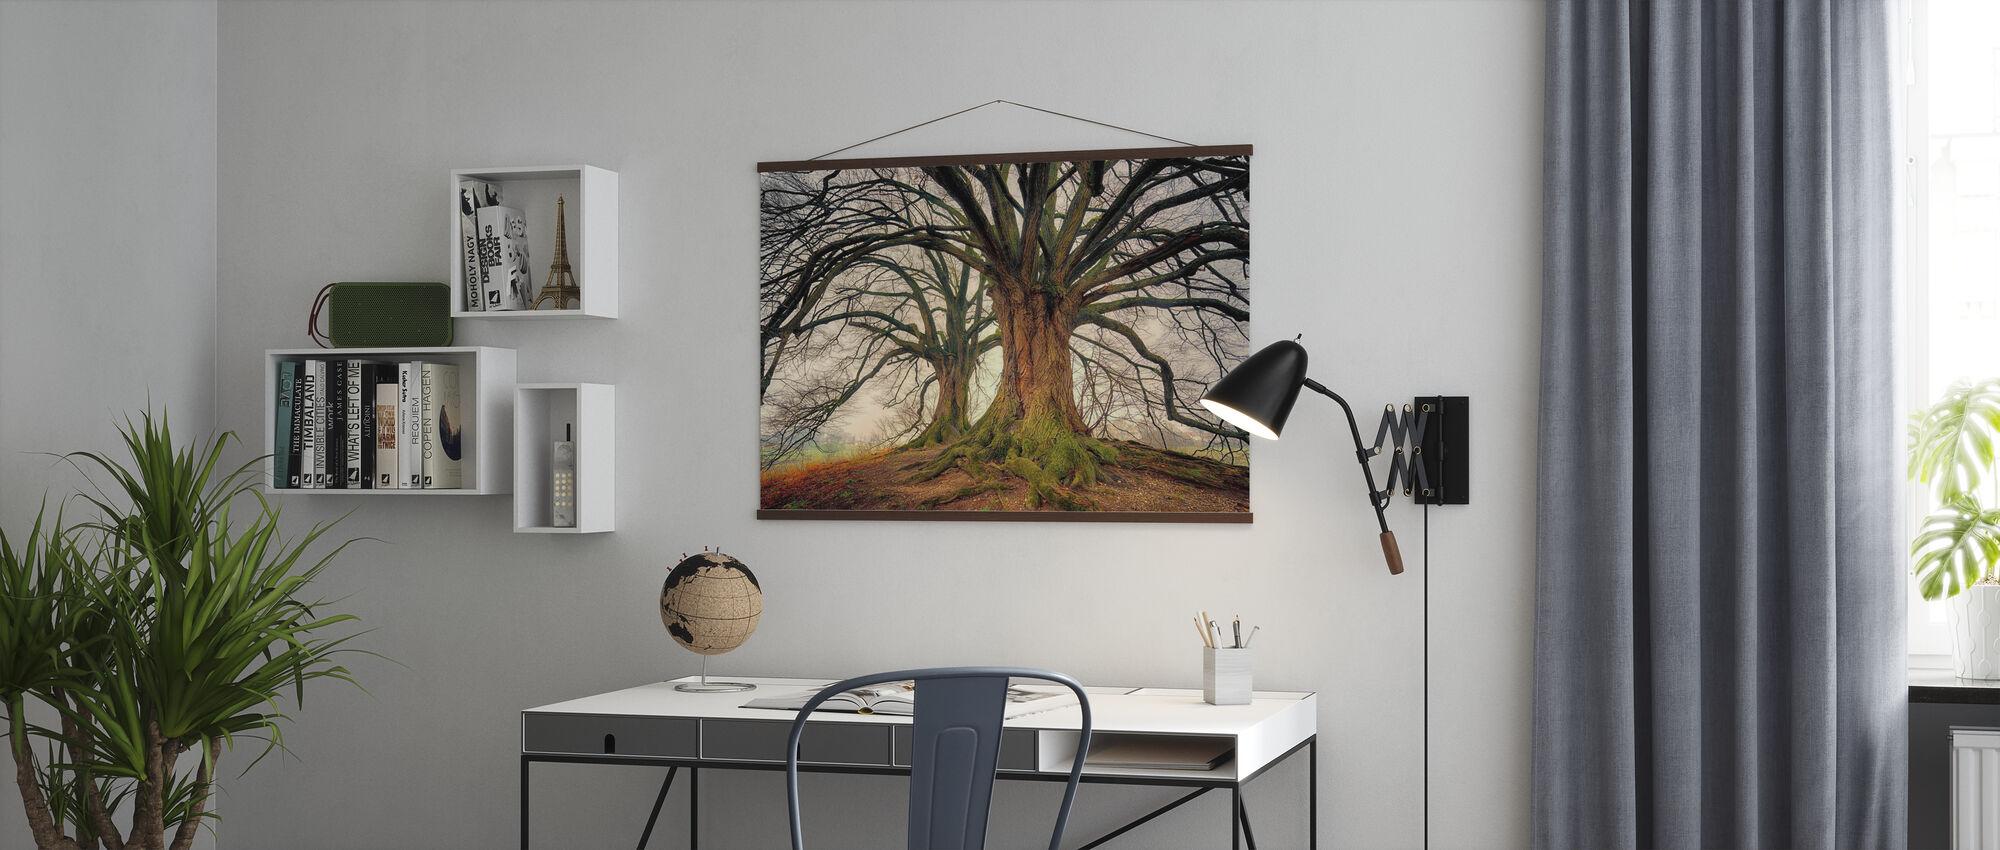 Big Kahl Treet - Plakat - Kontor